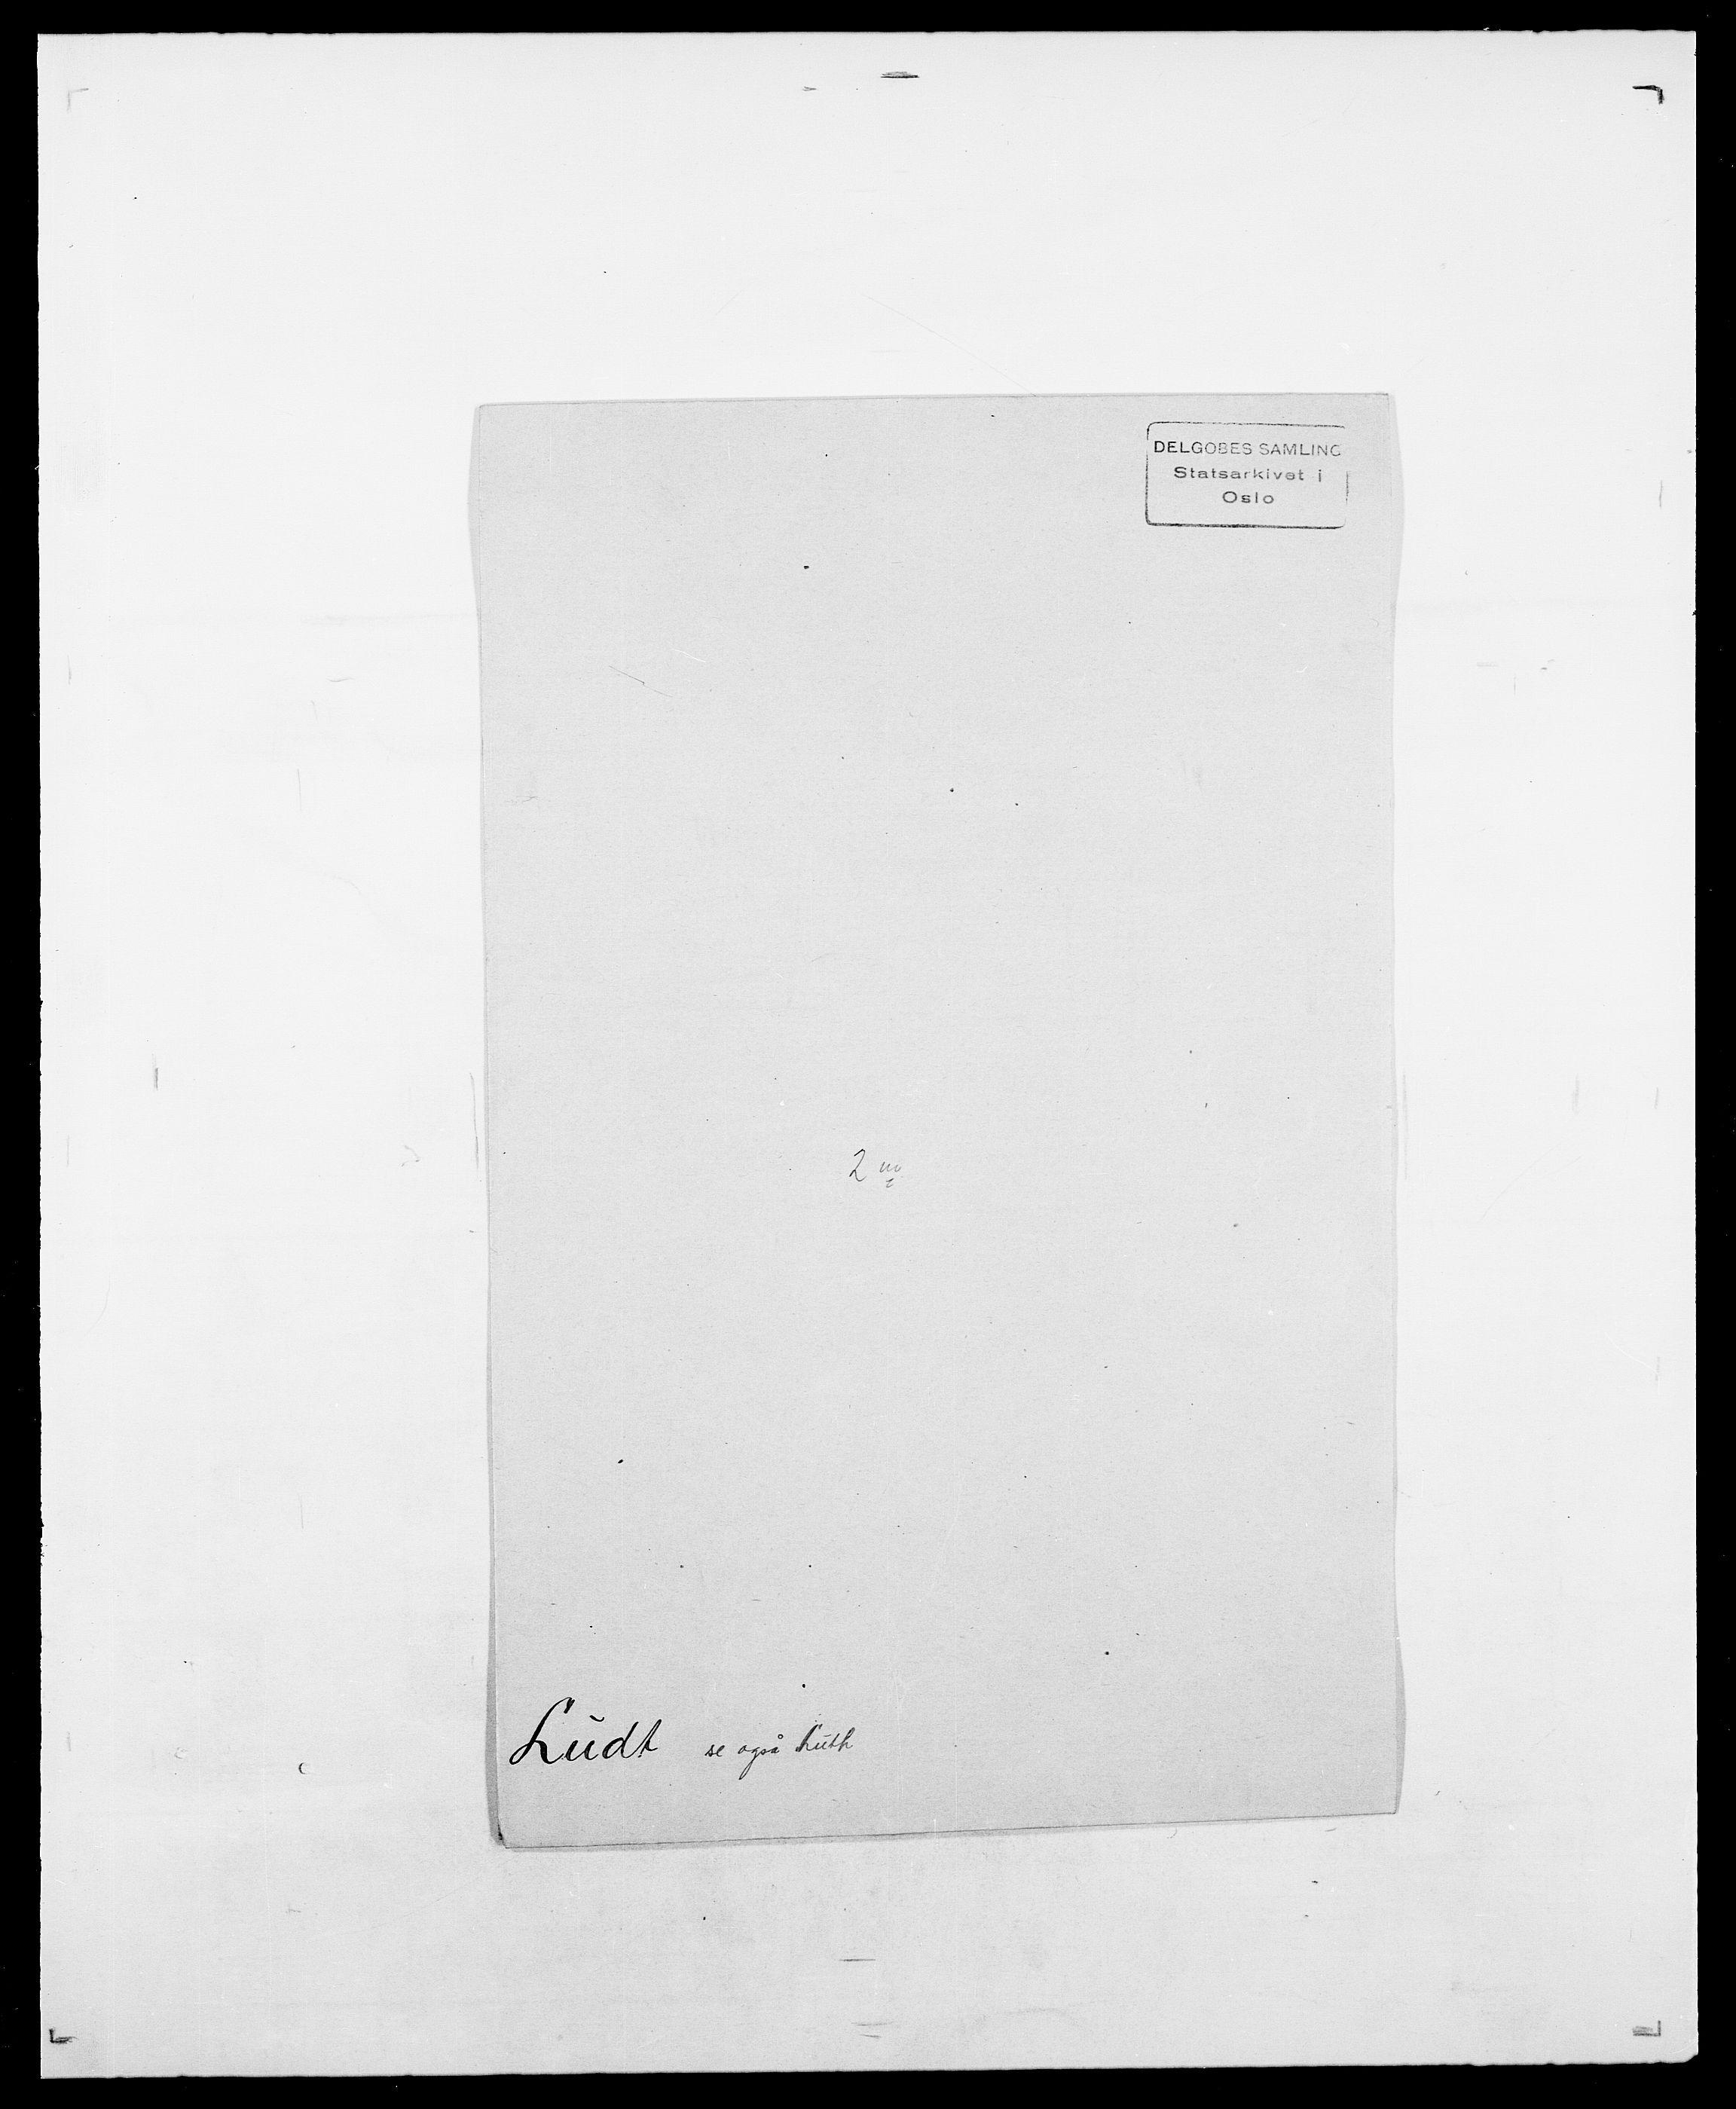 SAO, Delgobe, Charles Antoine - samling, D/Da/L0024: Lobech - Lærum, s. 373